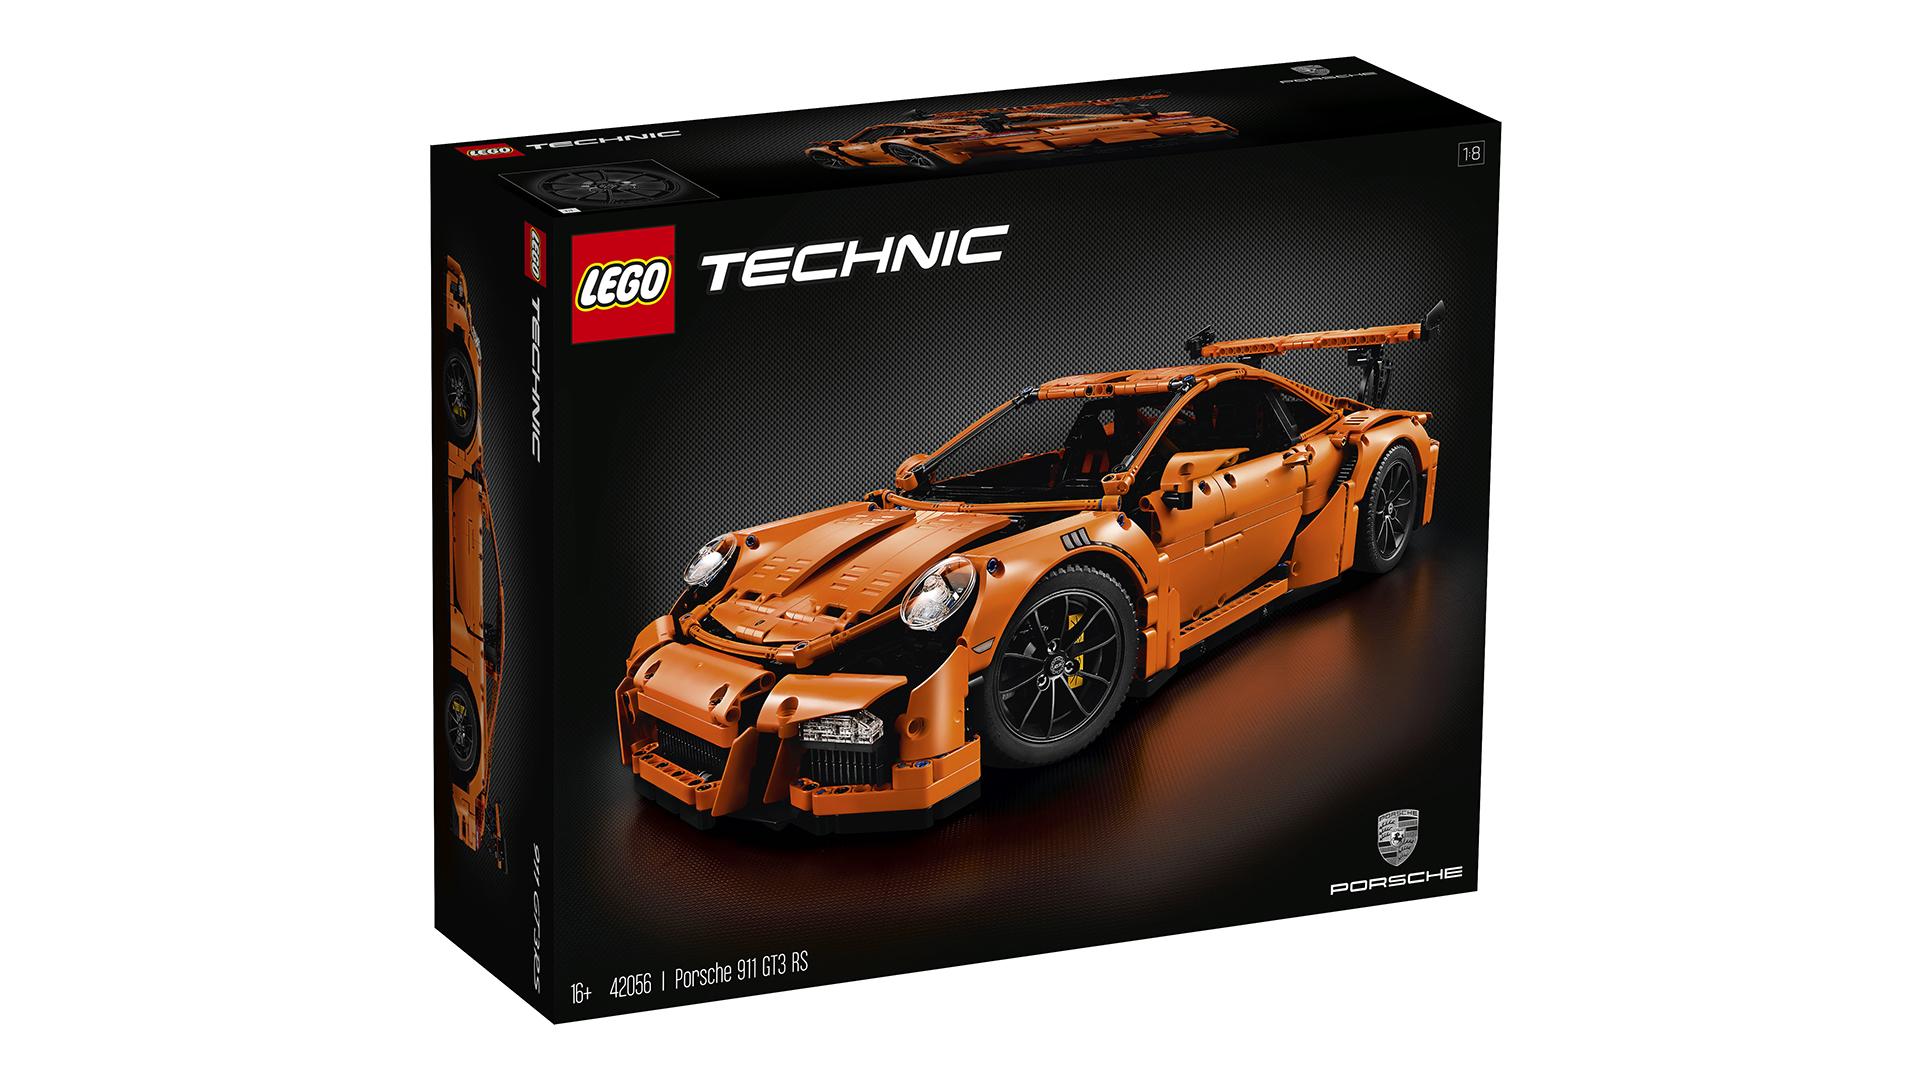 BBC - Autos - Lego's 2,704-piece Porsche is not a toy